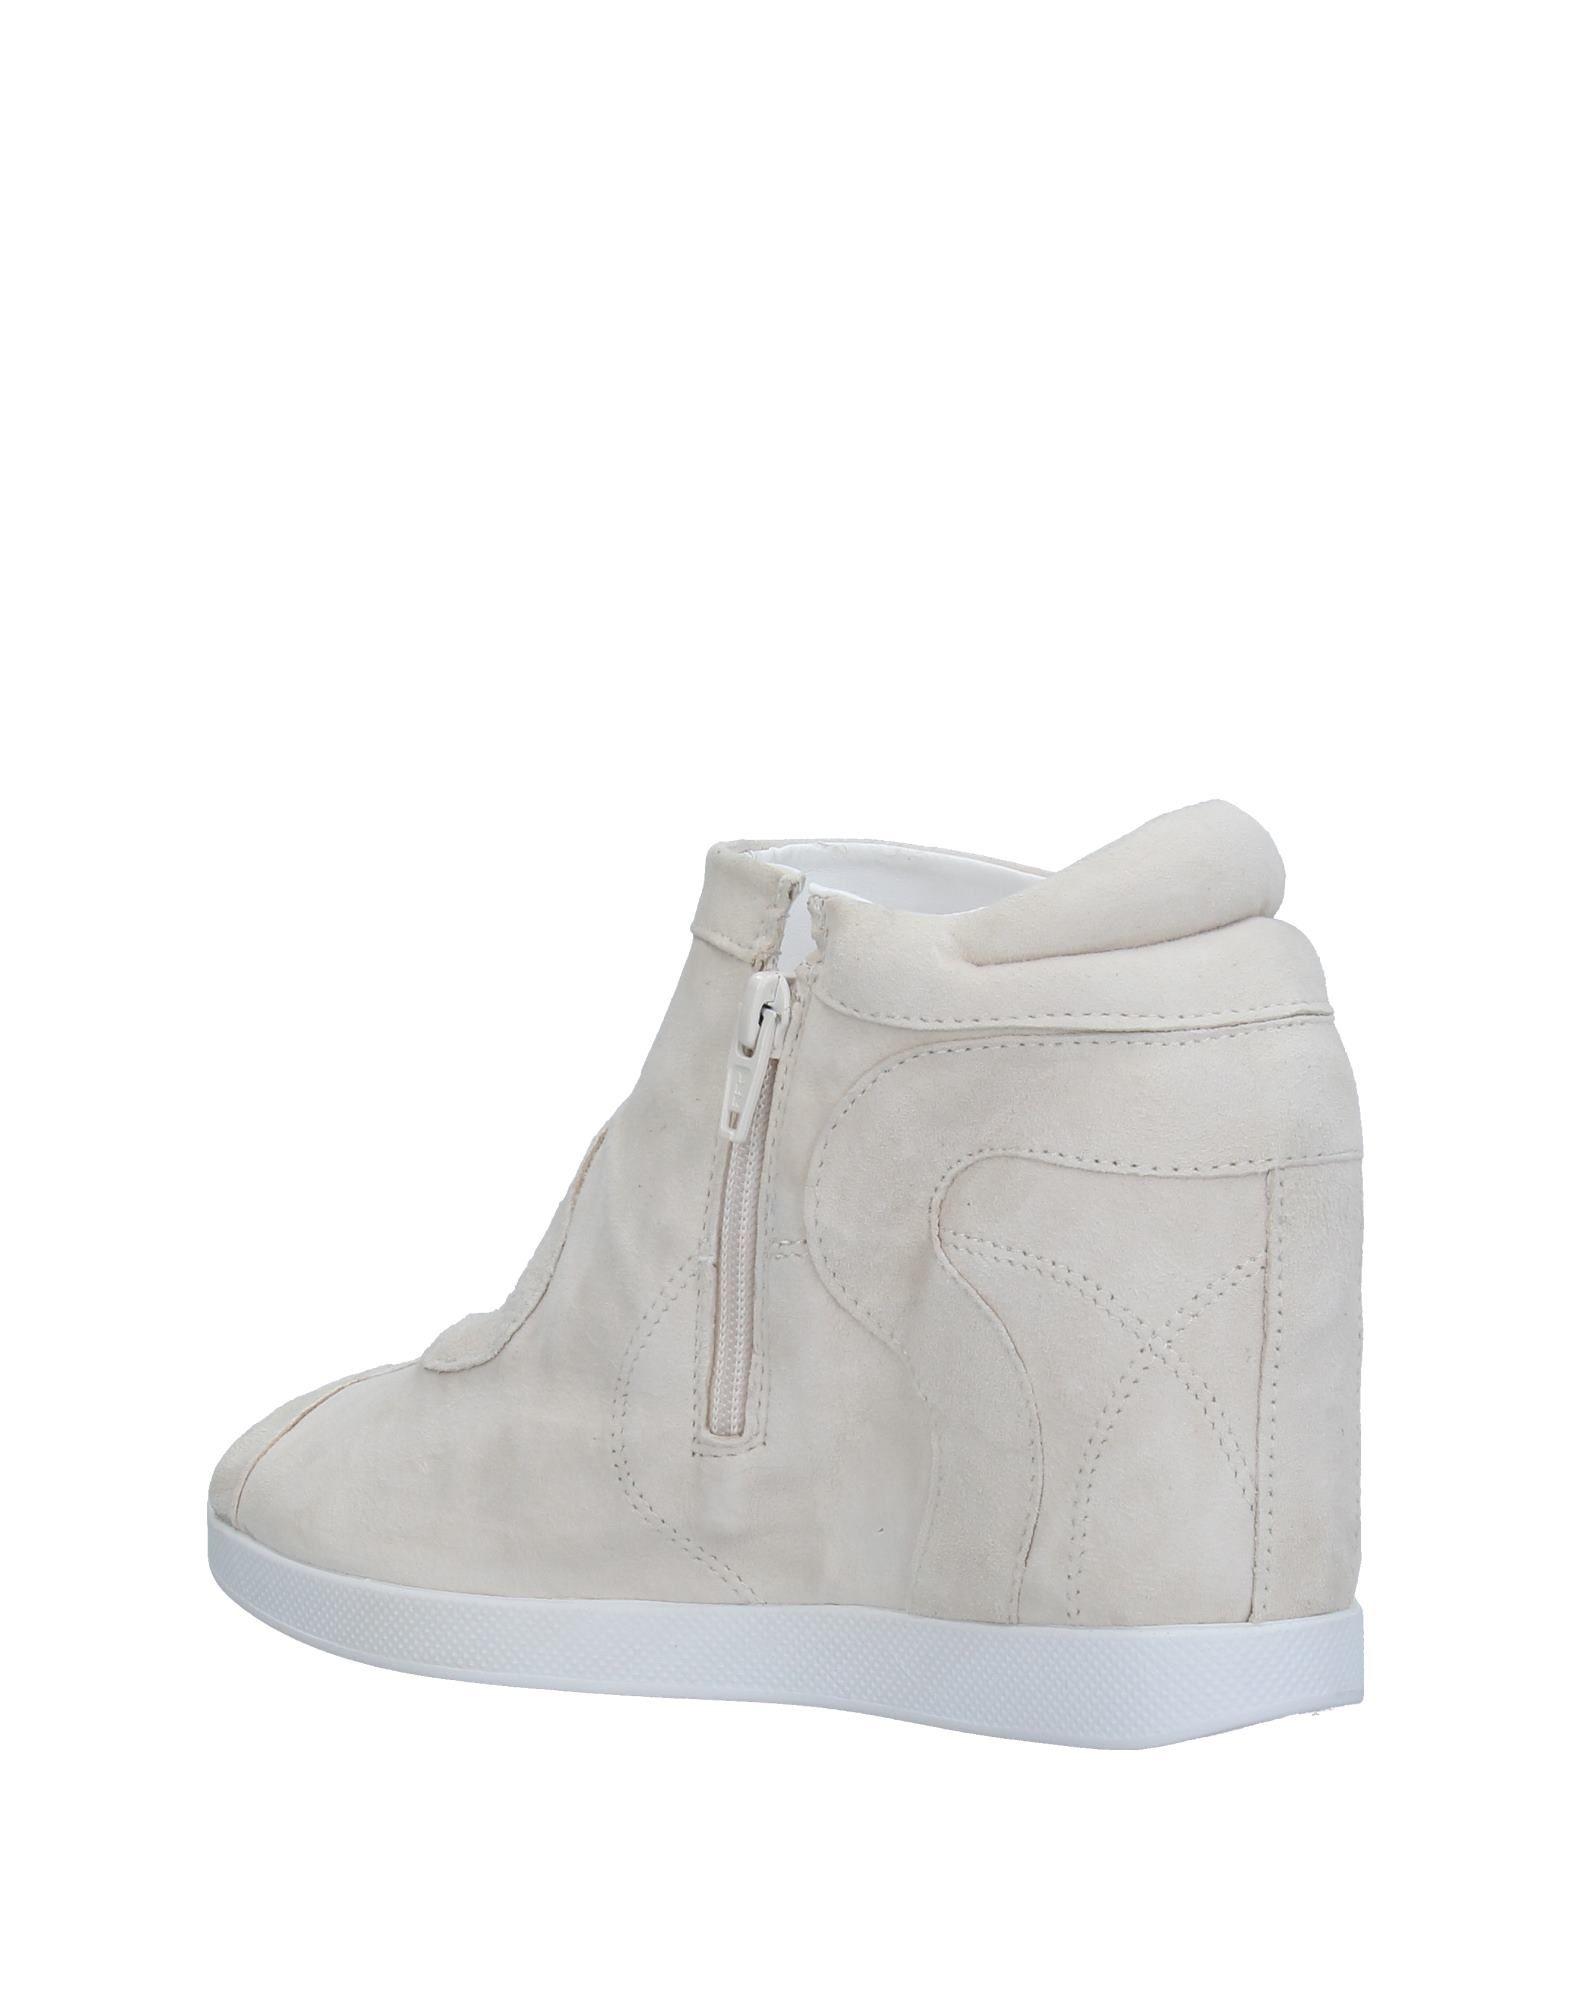 Ruco Line Sneakers Damen  11335207TM Qualität Gute Qualität 11335207TM beliebte Schuhe 3e8cee